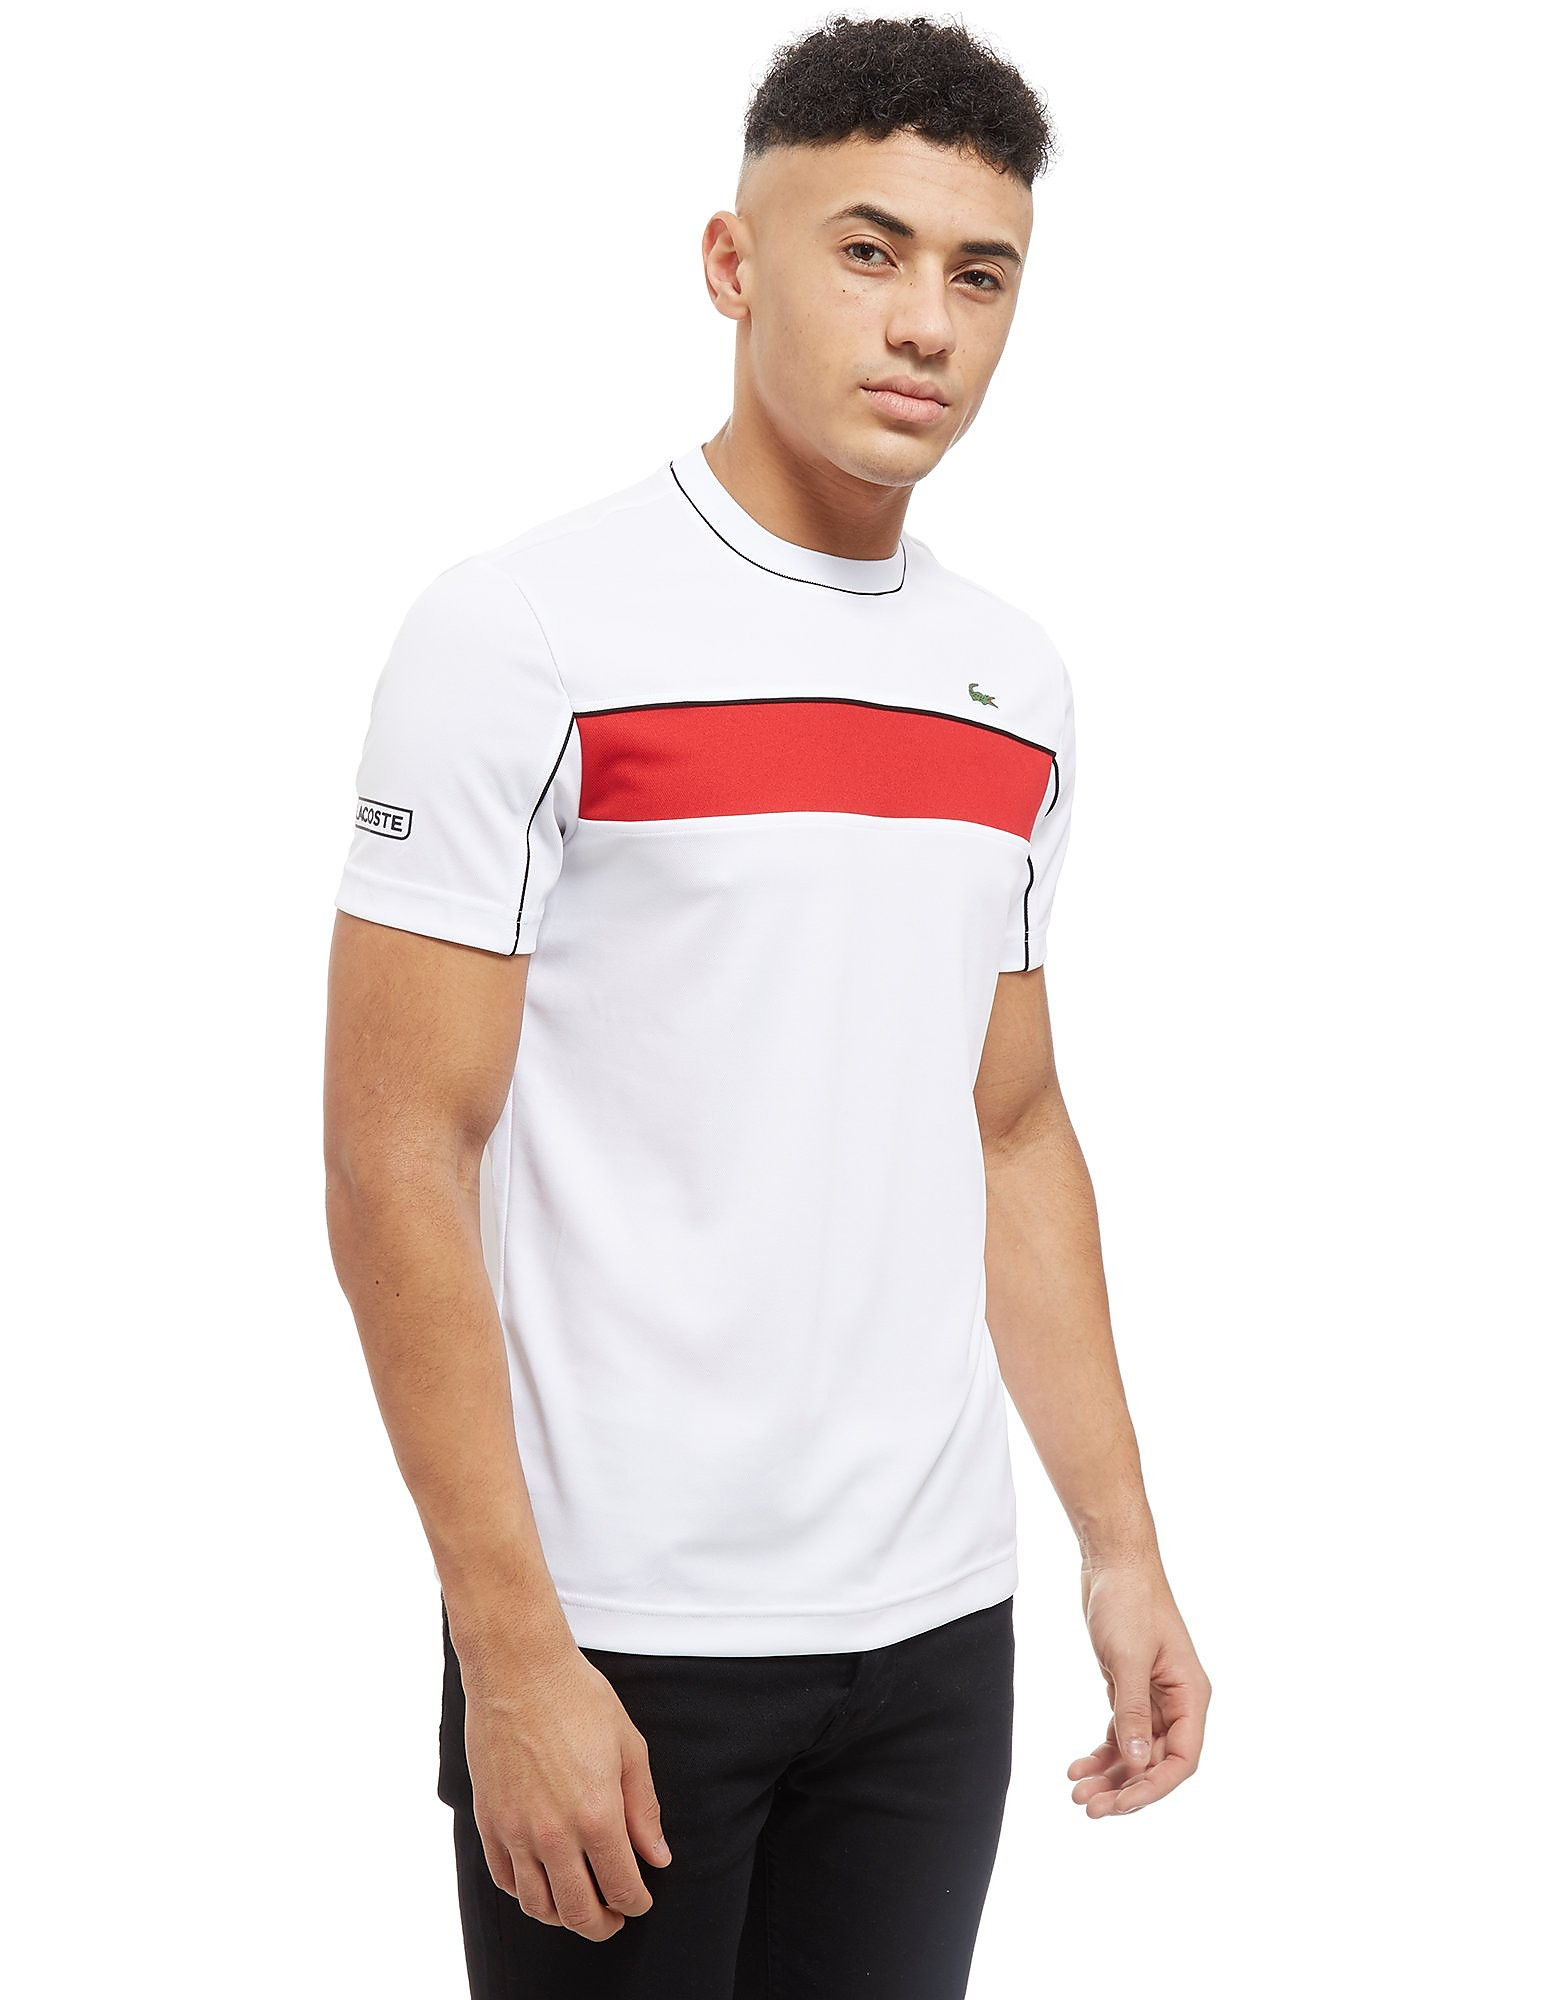 Lacoste Djokovic Colourblock Tech T-Shirt